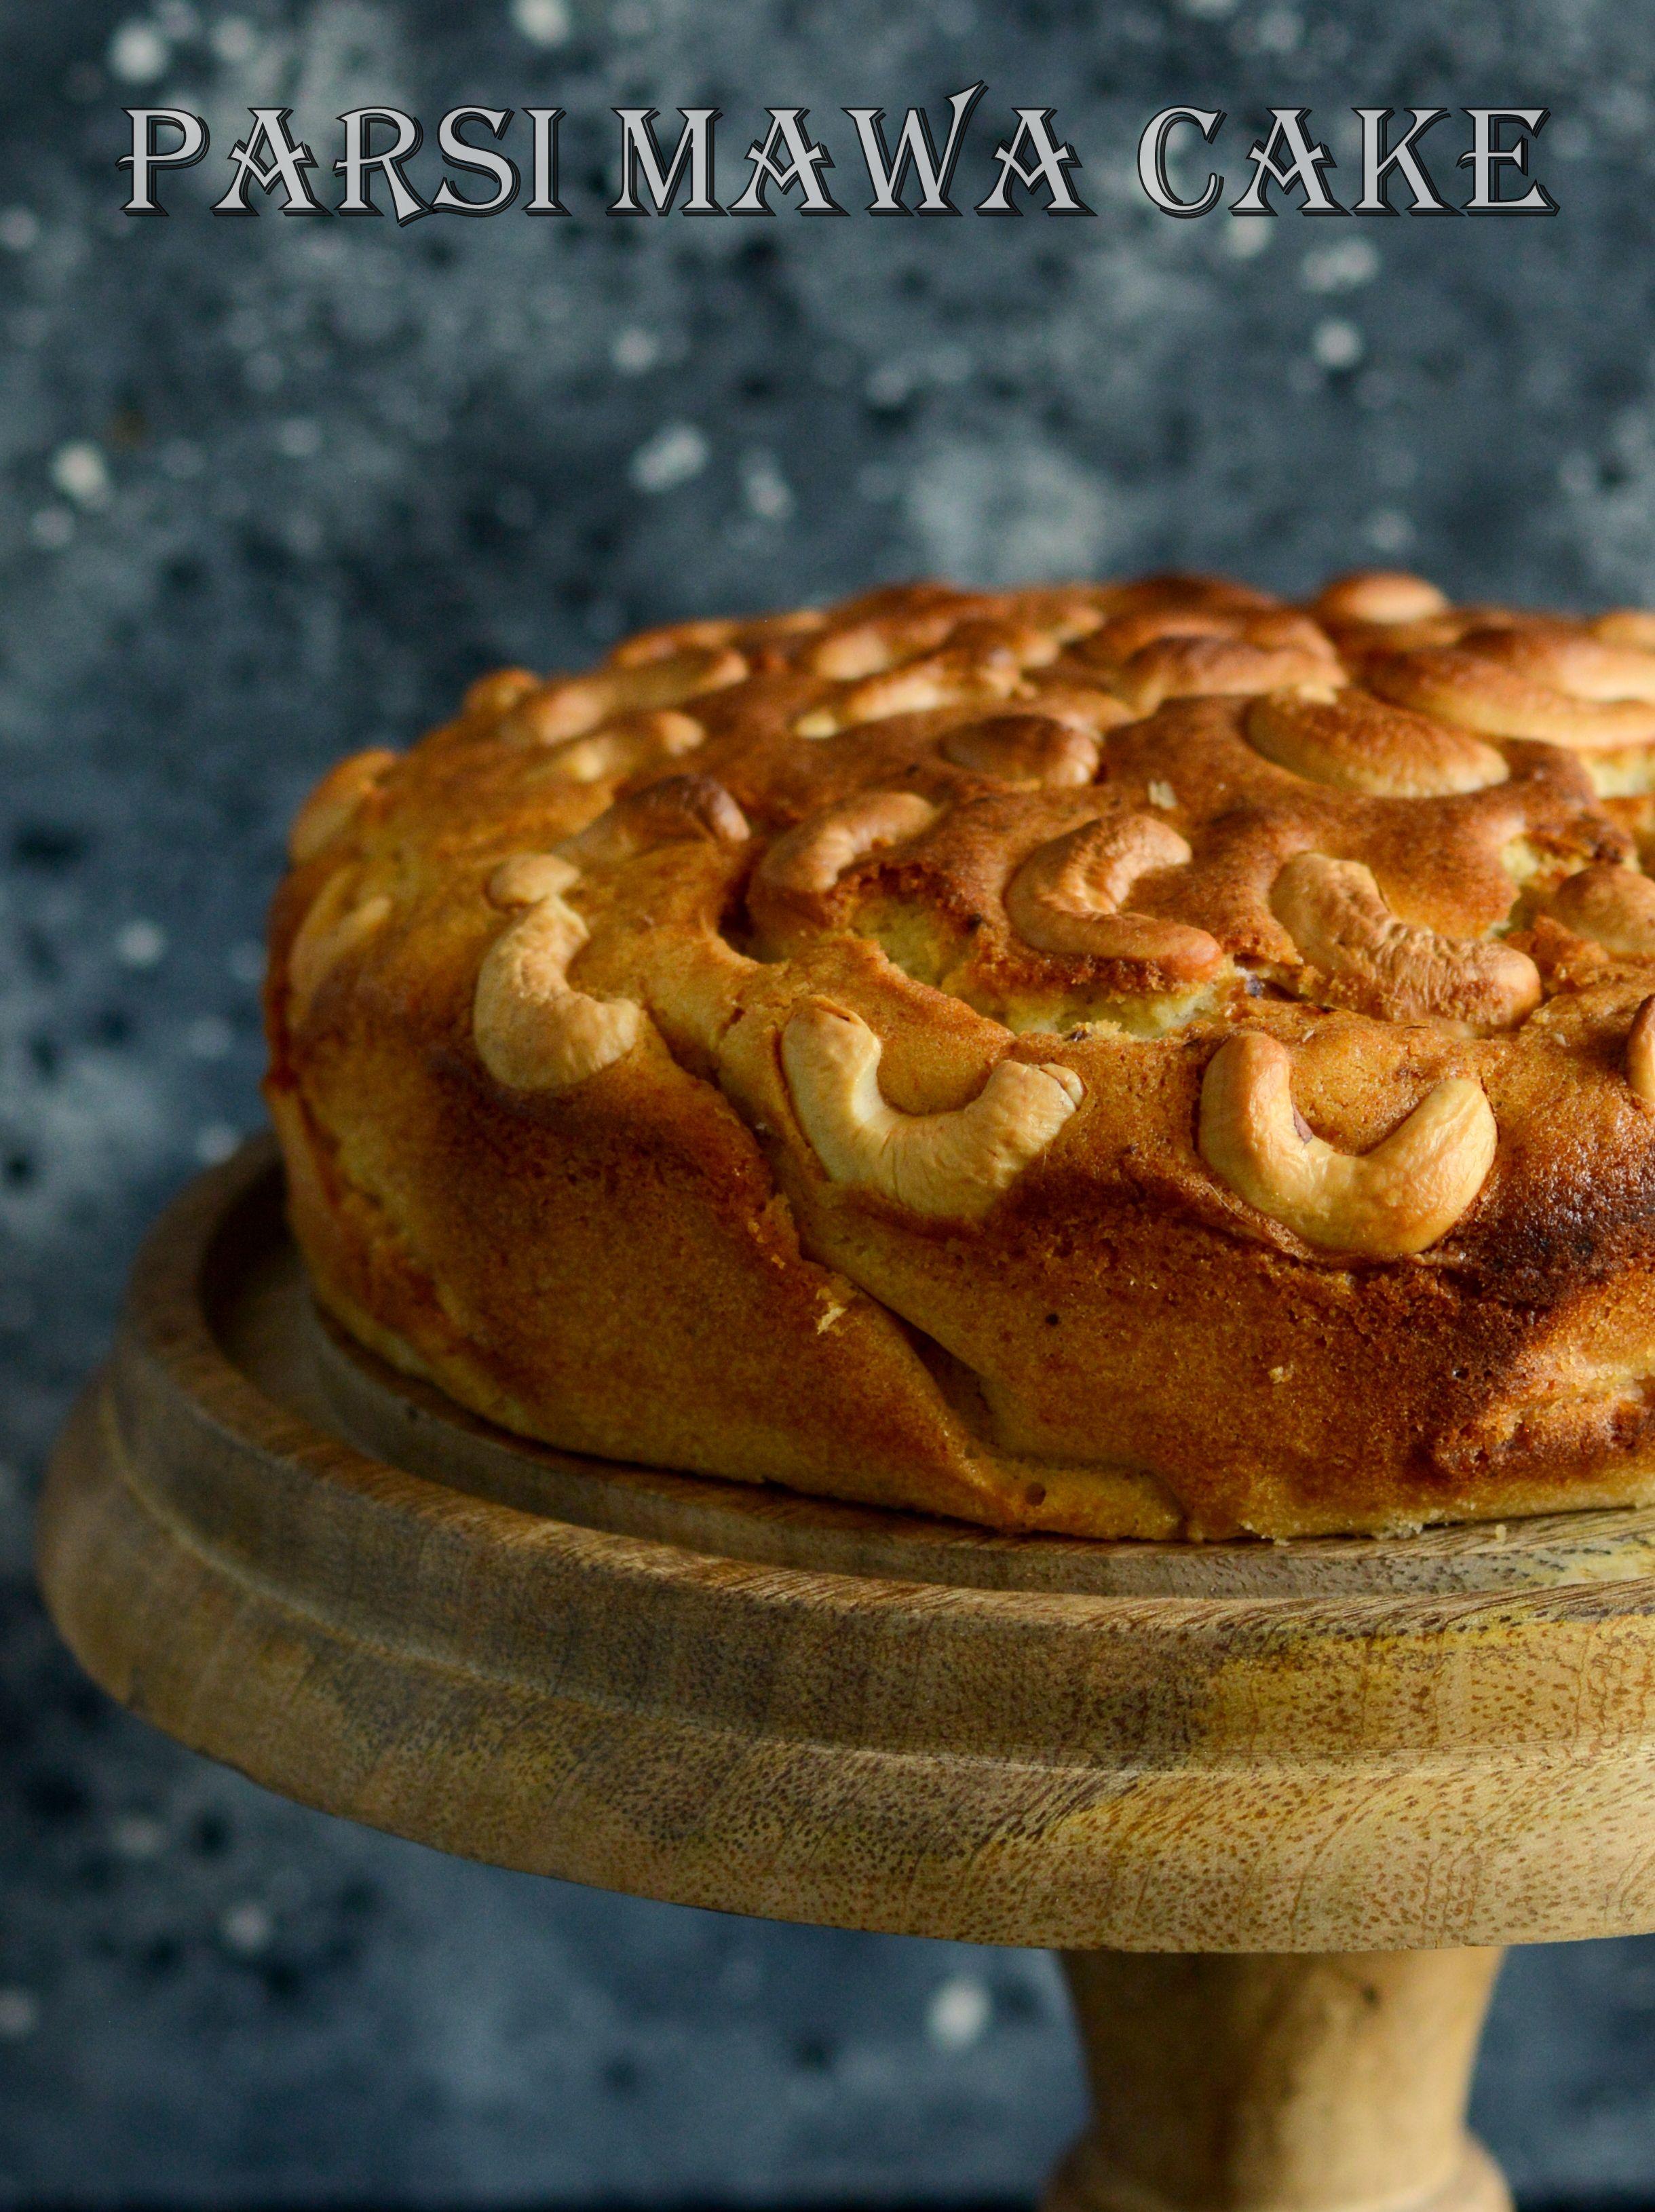 Parsi Mawa Cake Recipe With Images How To Make Cake Tea Time Food Bakery